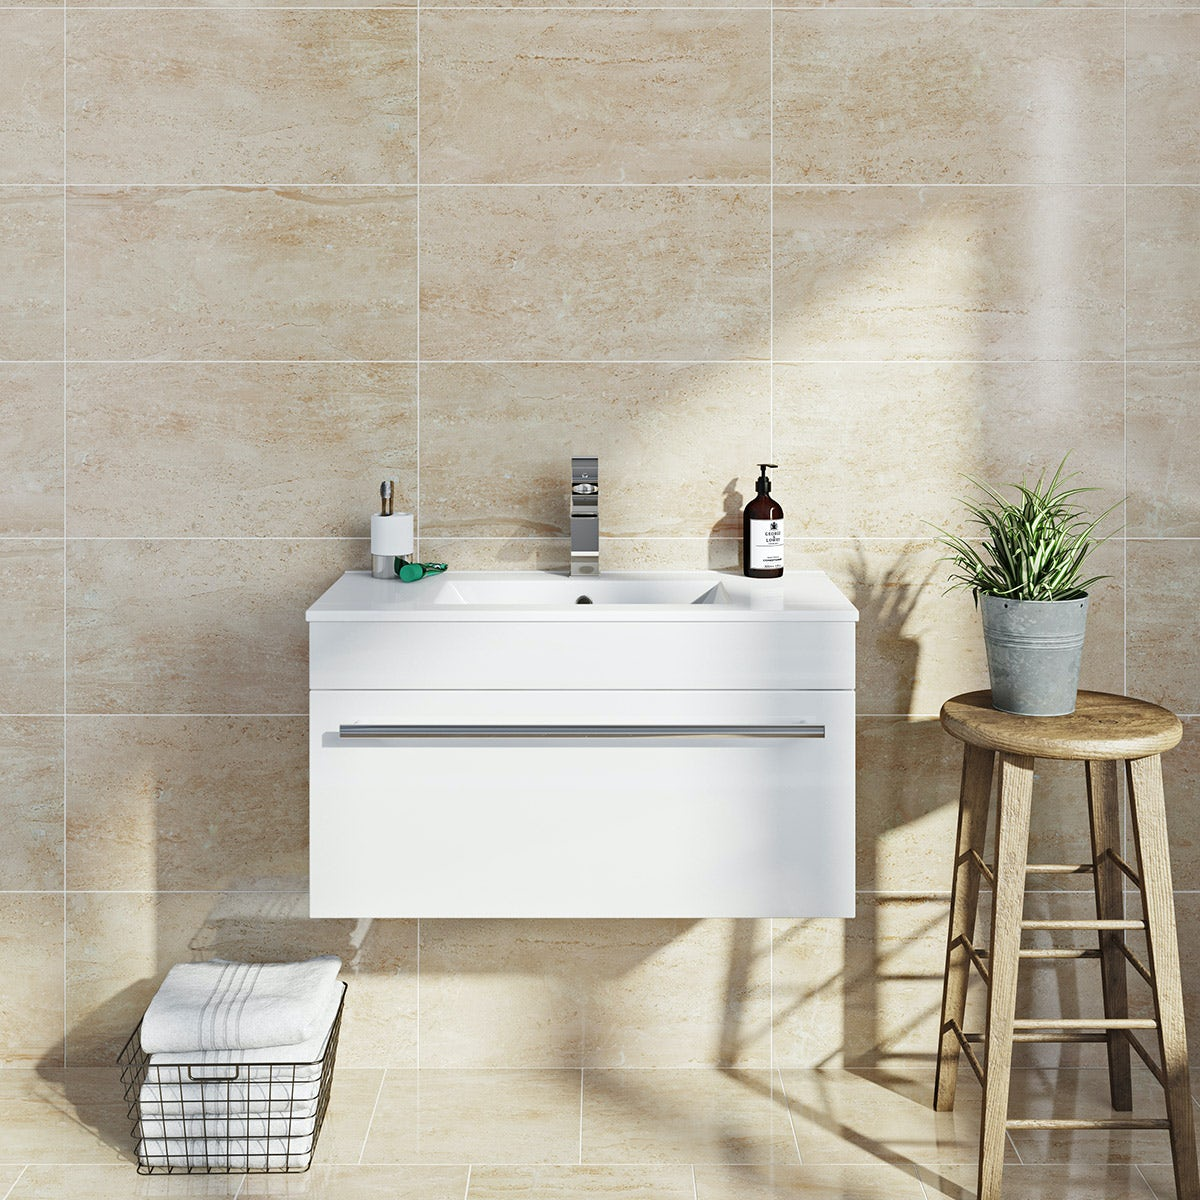 British Ceramic Tile Lux beige gloss tile 298mm x 598mm